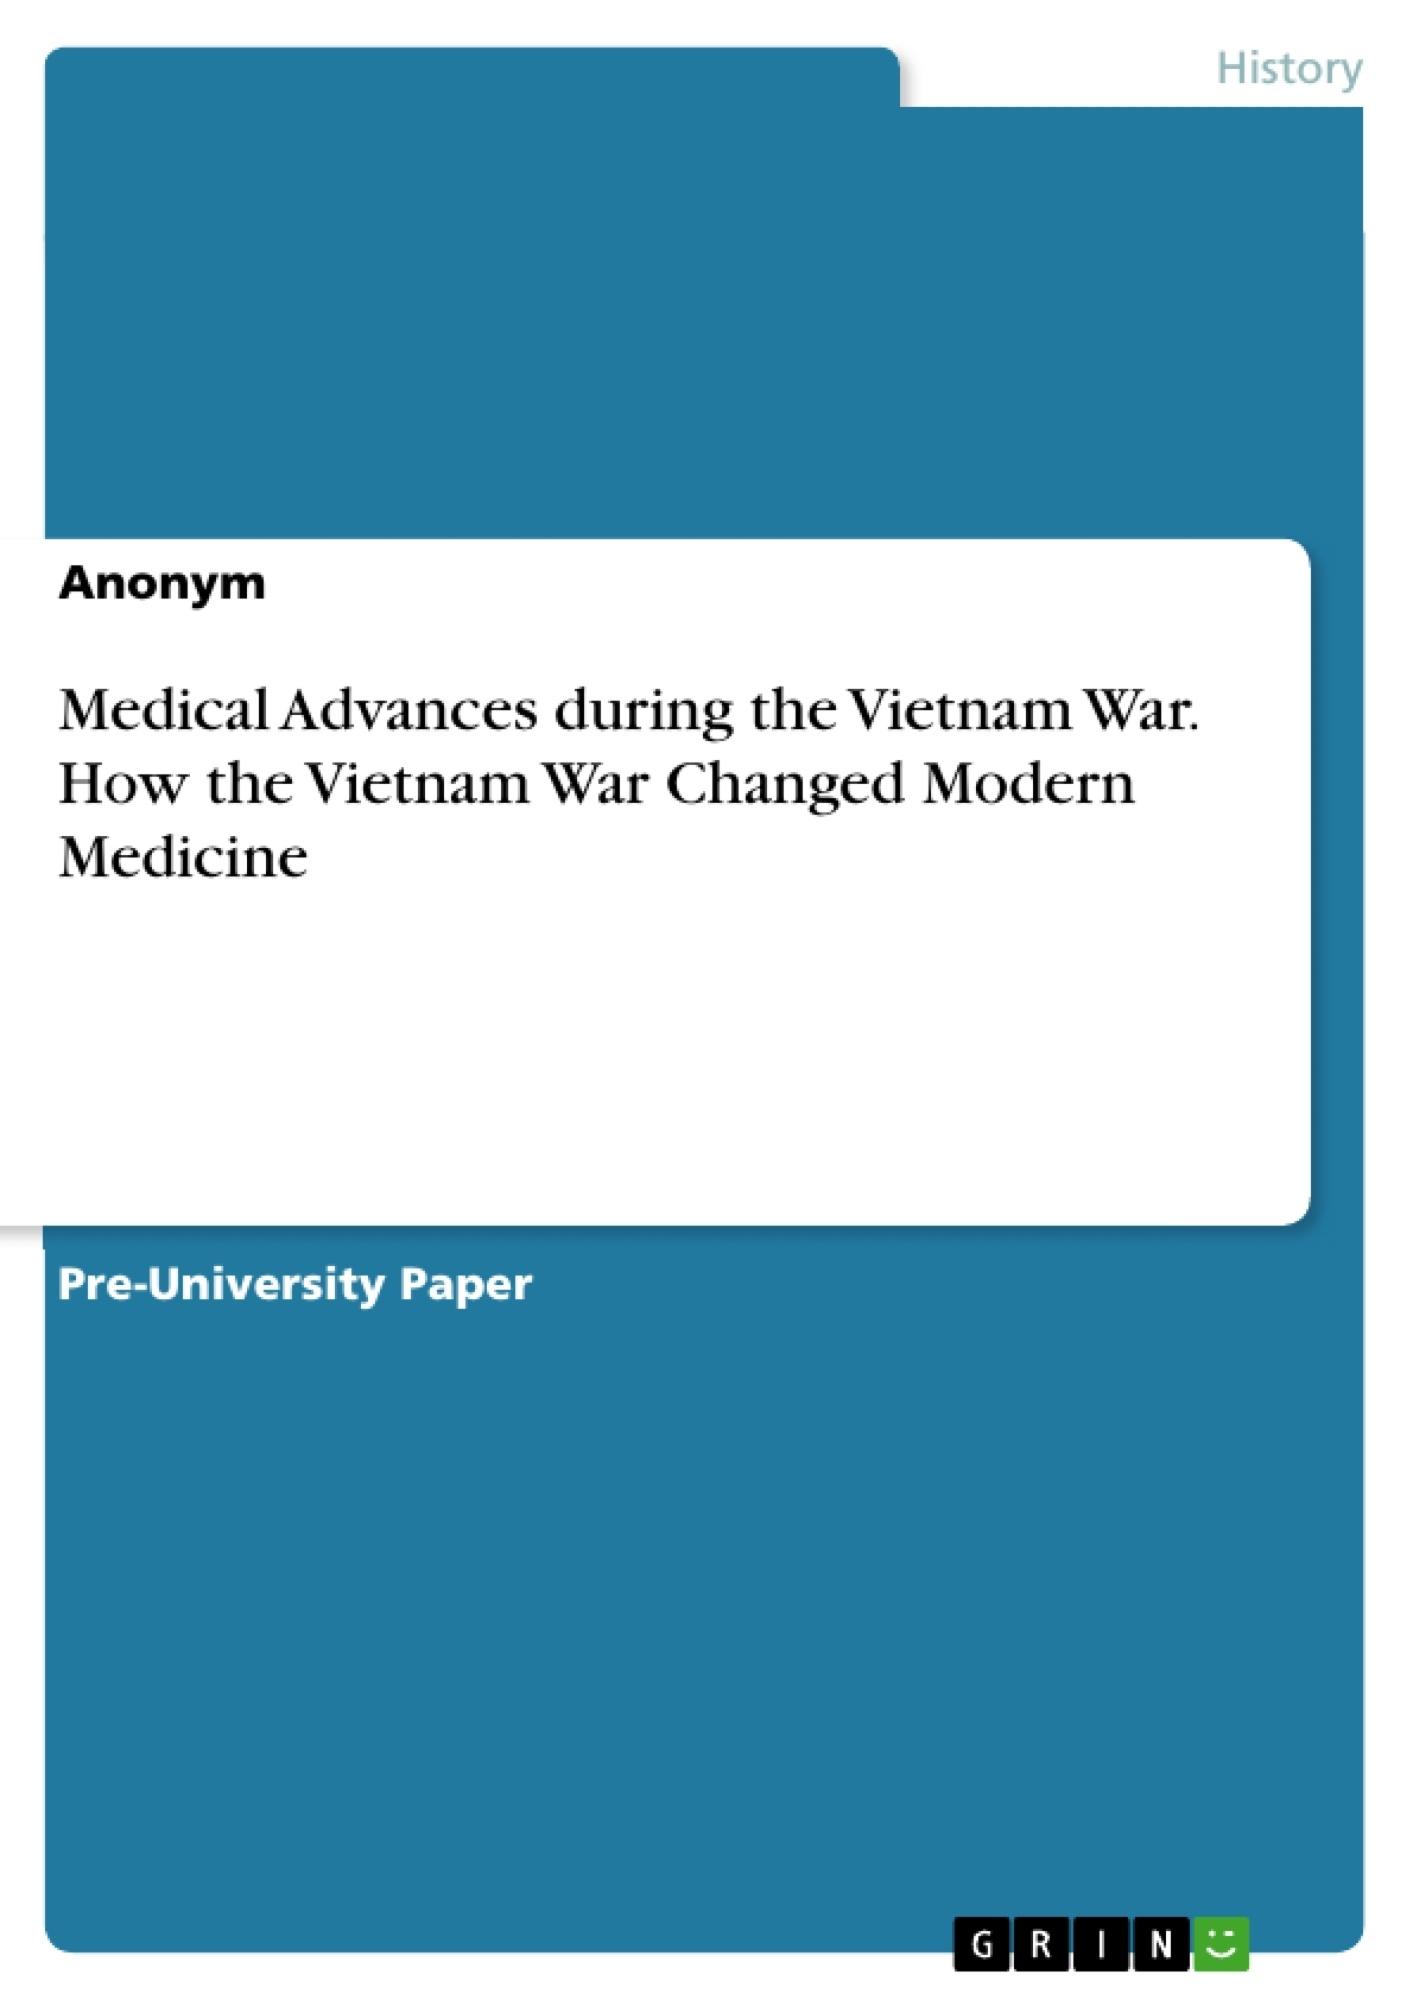 Title: Medical Advances during the Vietnam War. How the Vietnam War Changed Modern Medicine